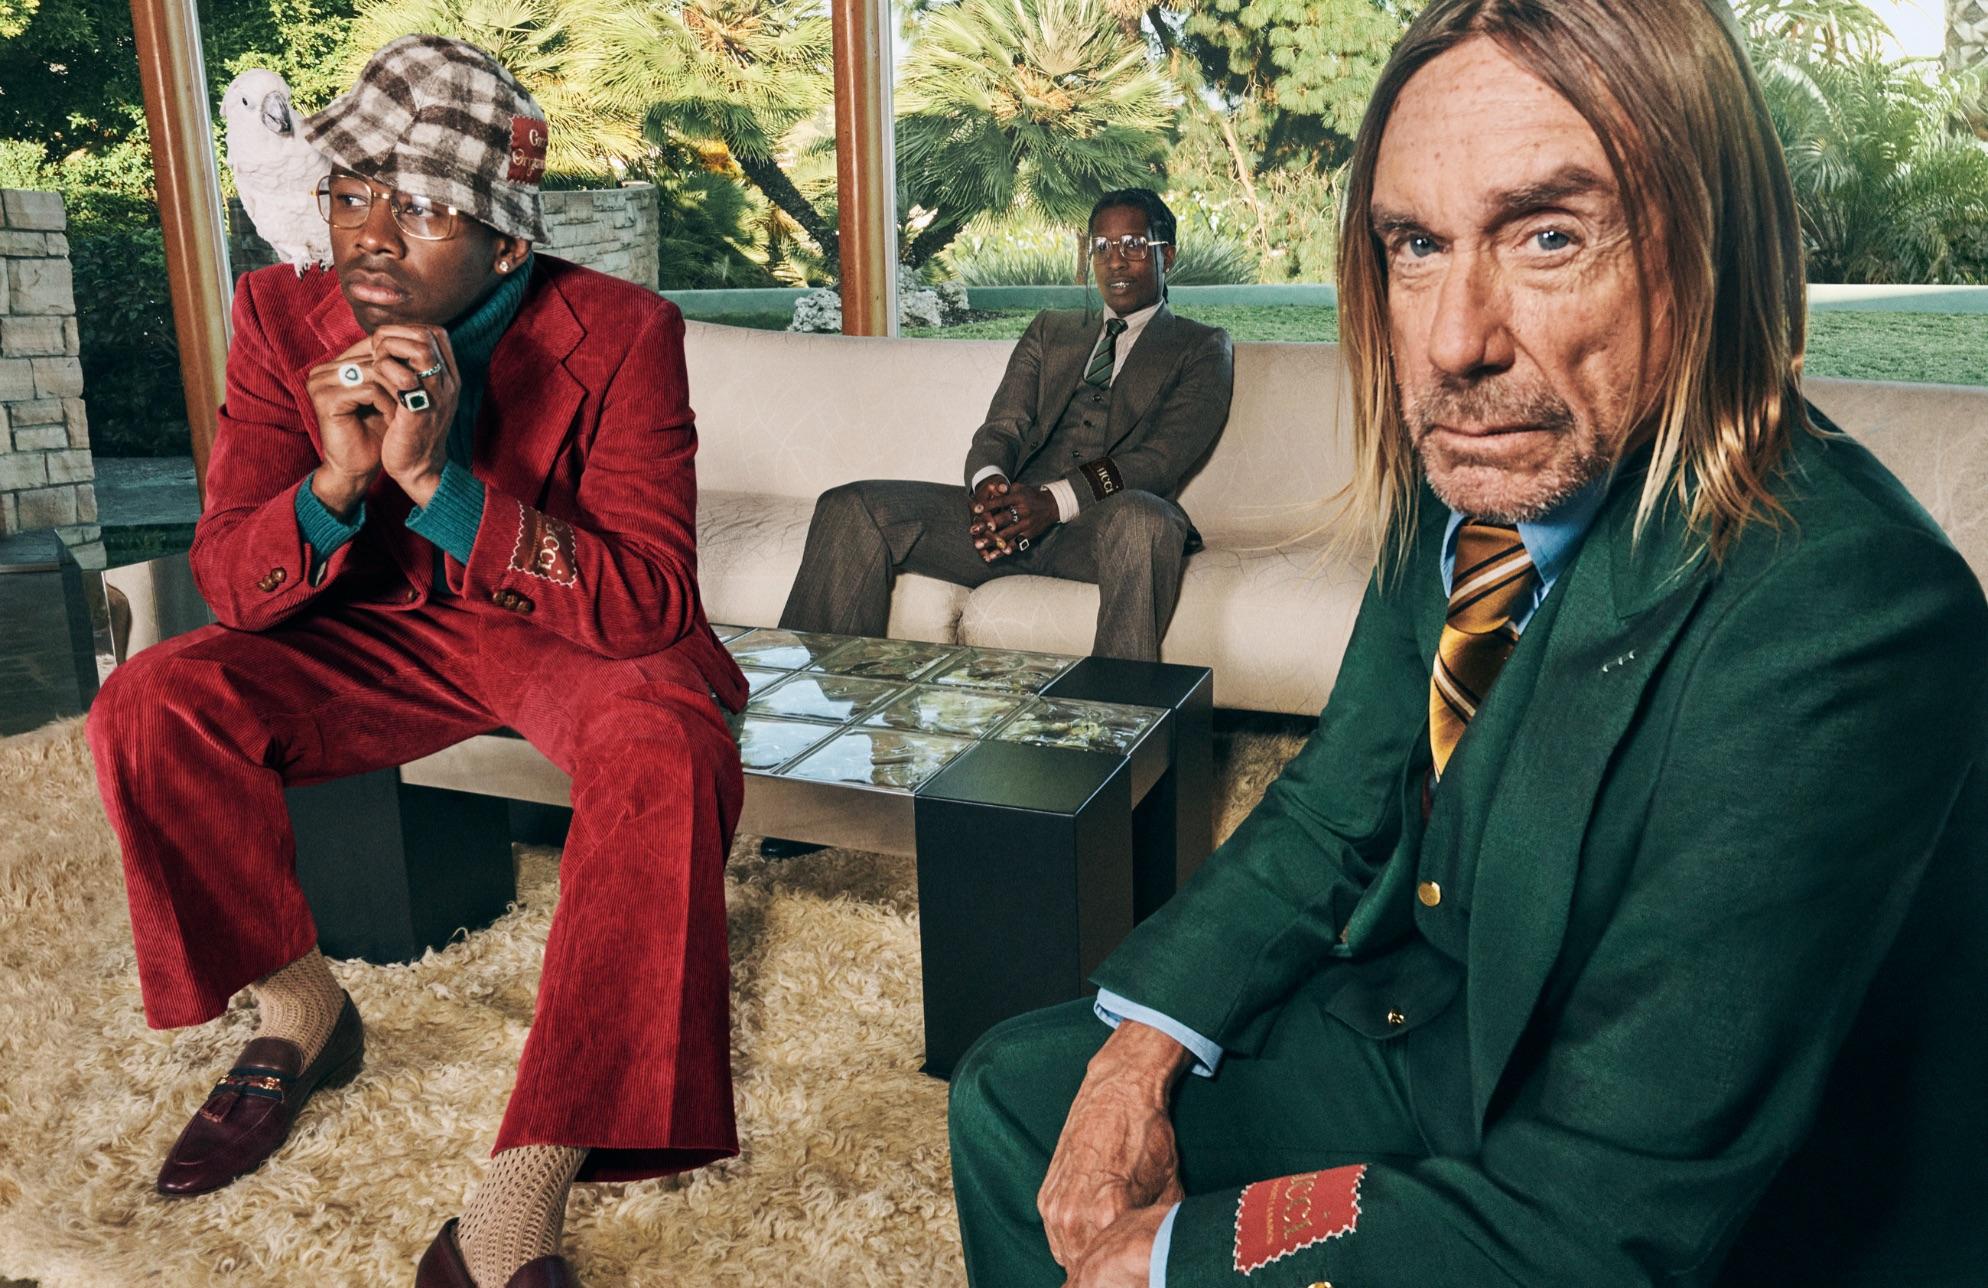 Gucci: Life of a Rock Star